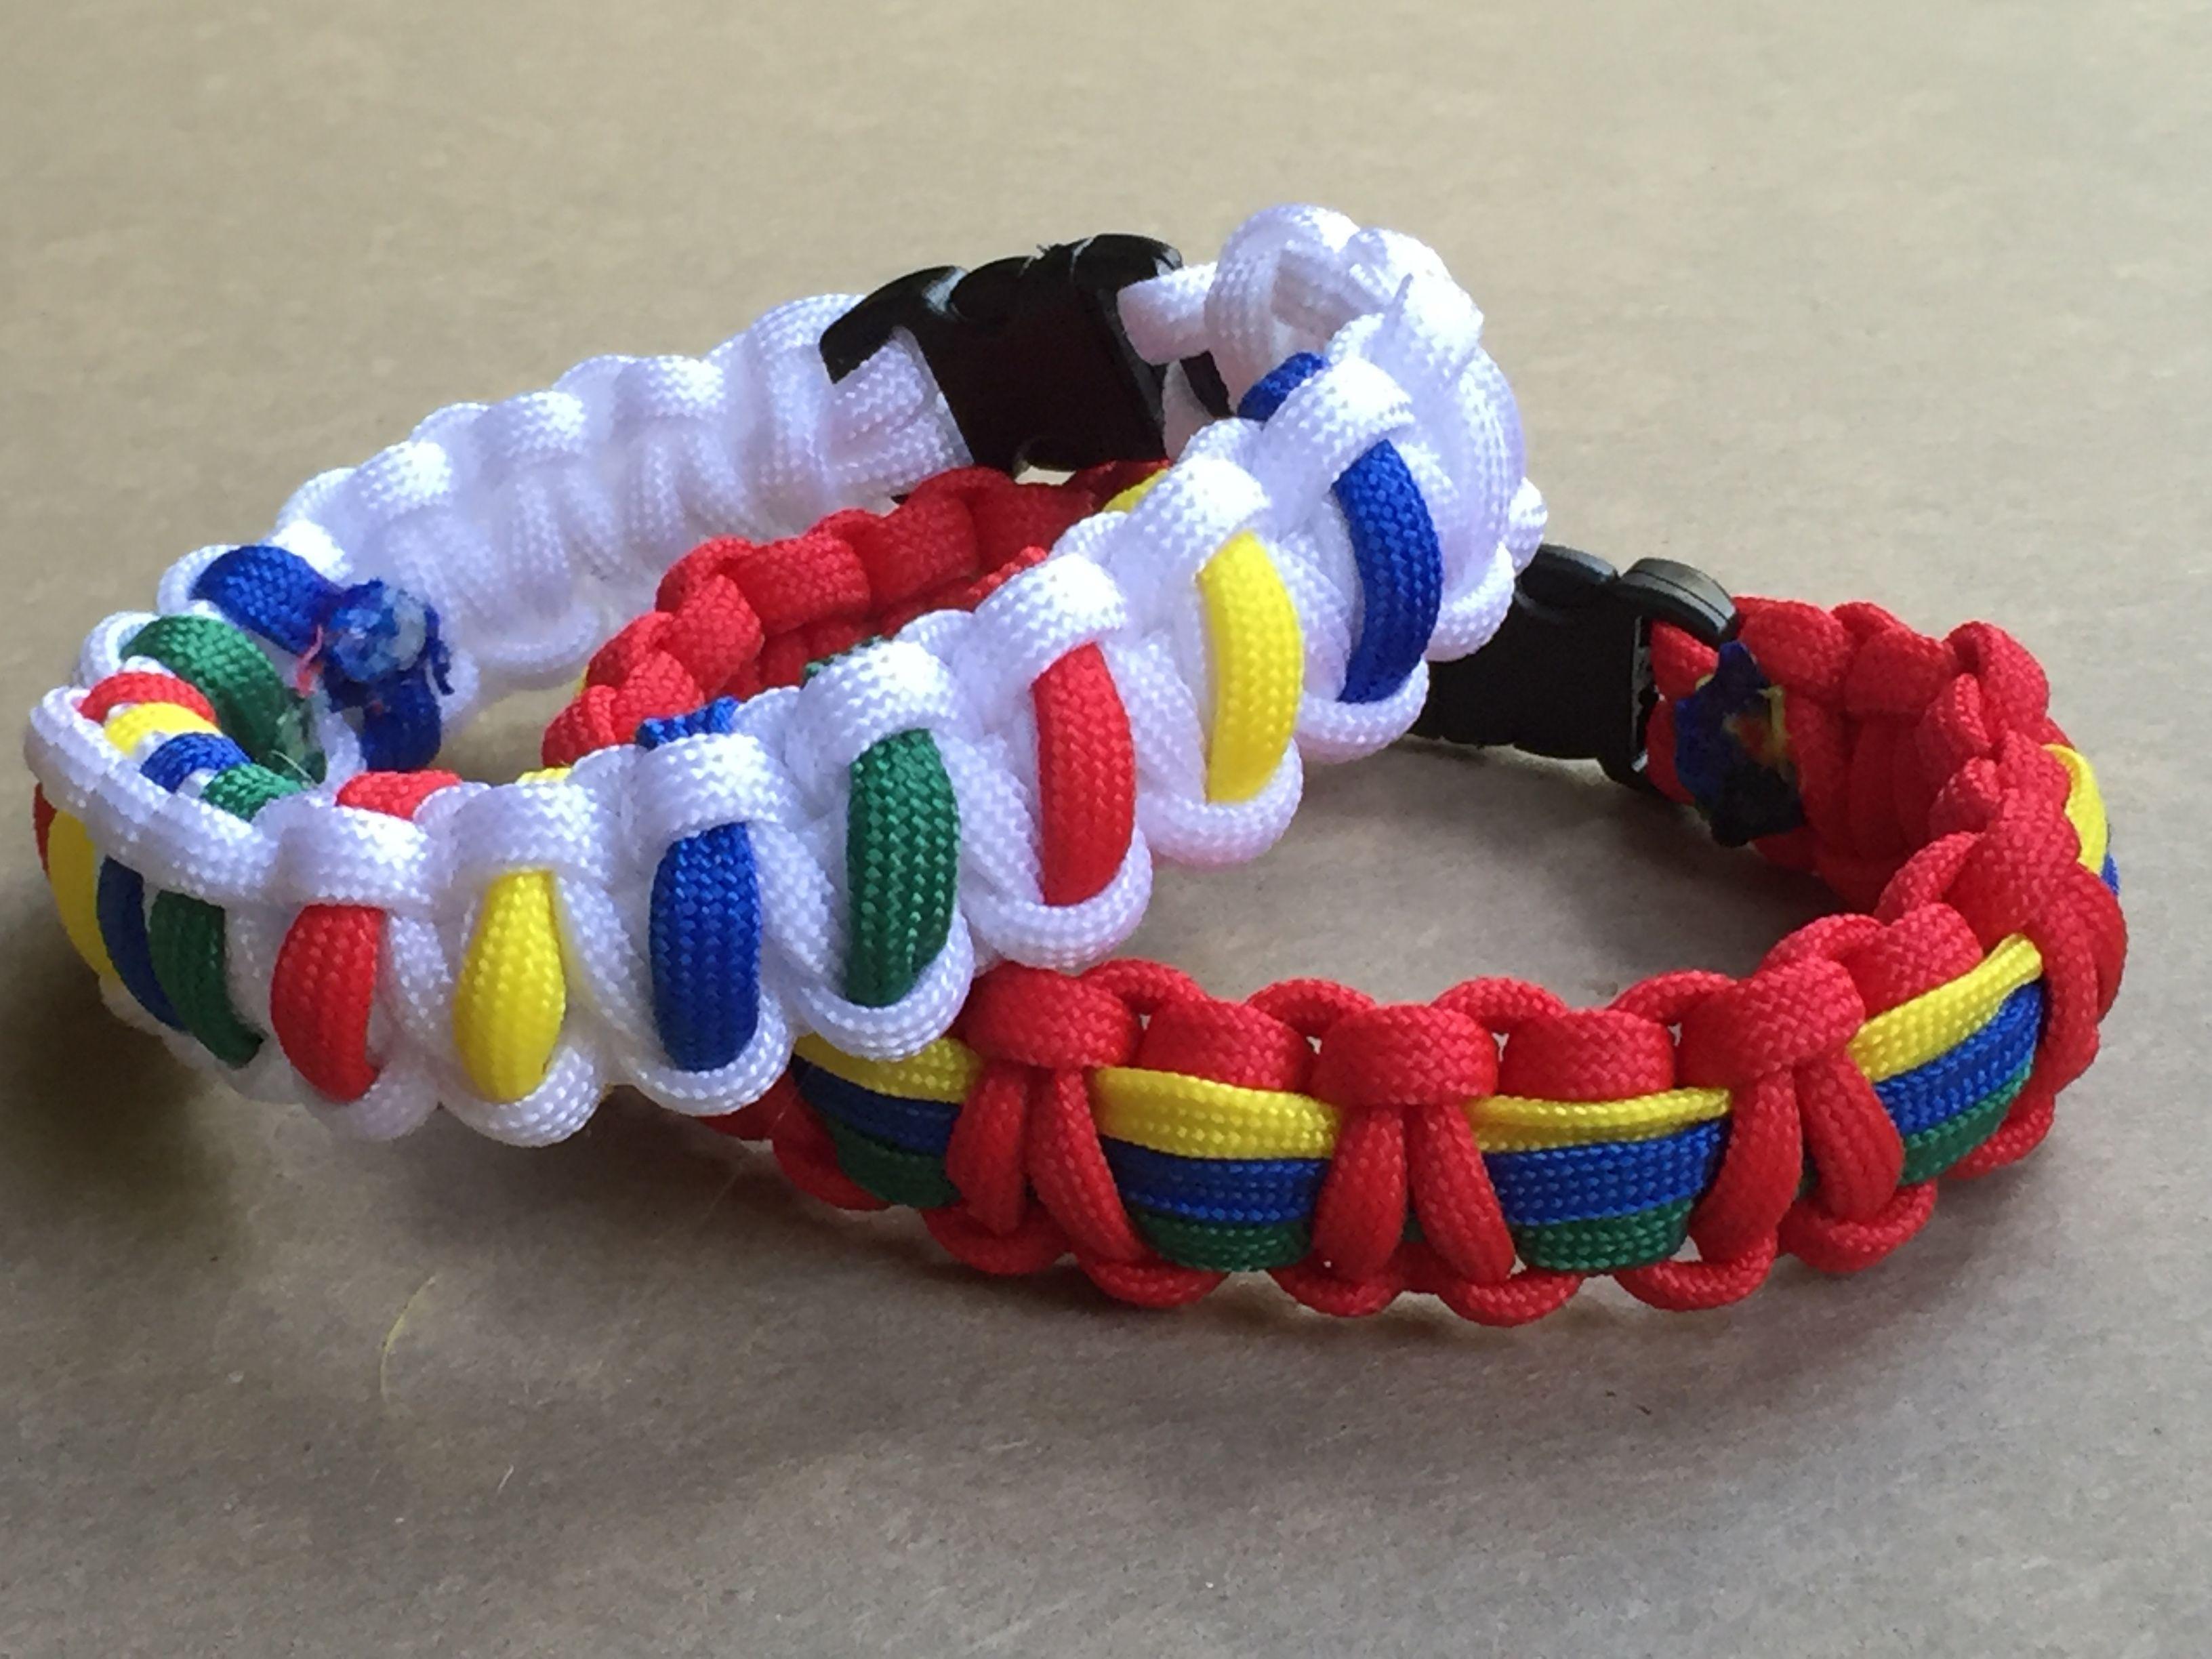 Autism Awareness Paracord Bracelet - Red cobra stitch paracord bracelet with…